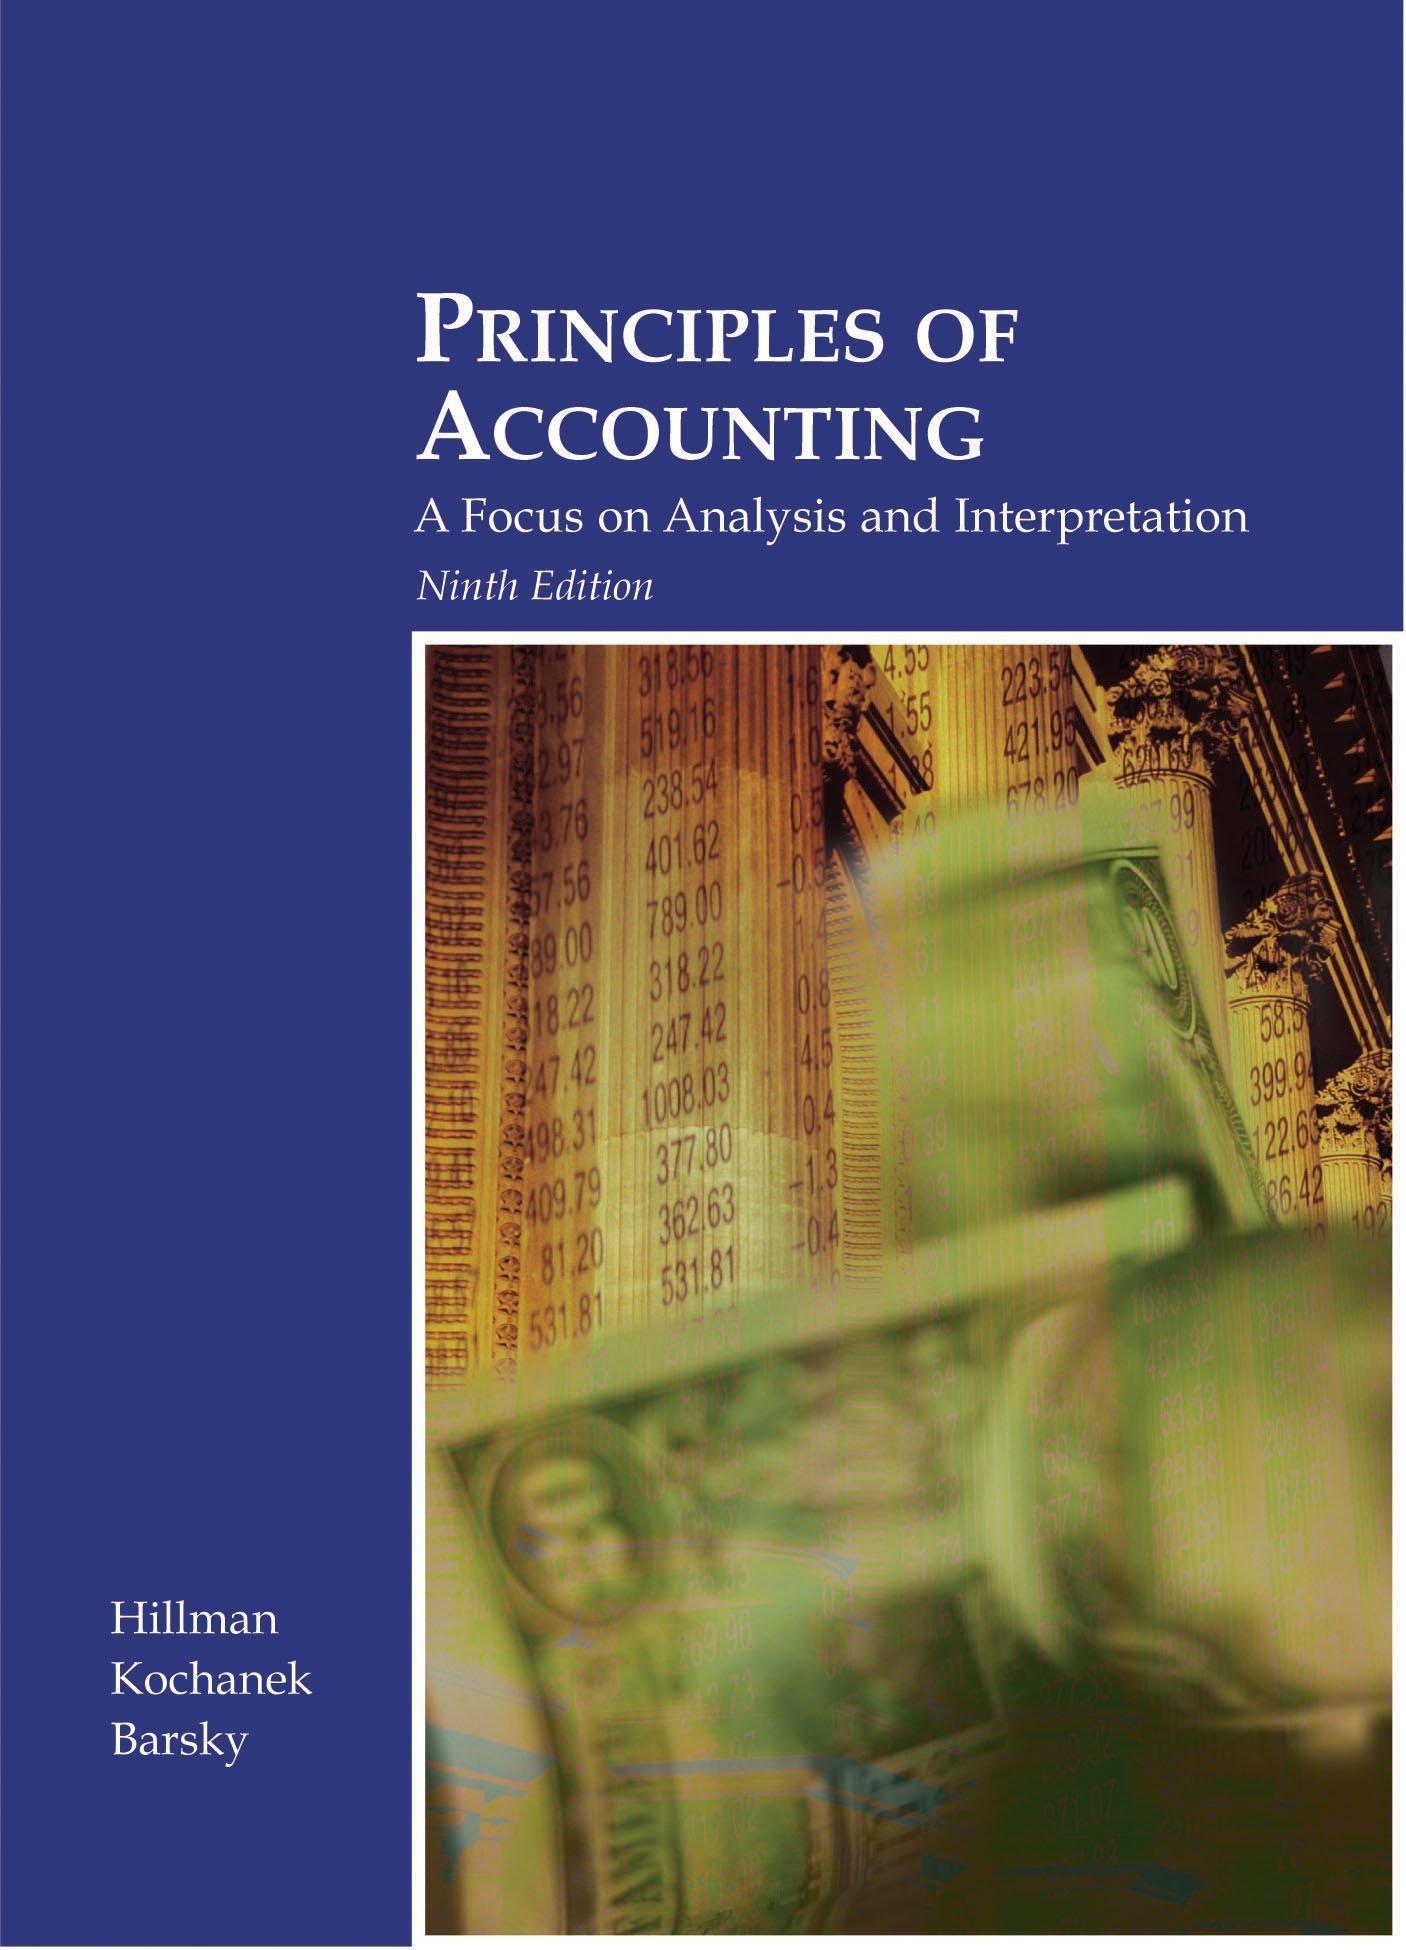 Download Principles of Accounting: A Focus on Analysis & Interpretation ebook